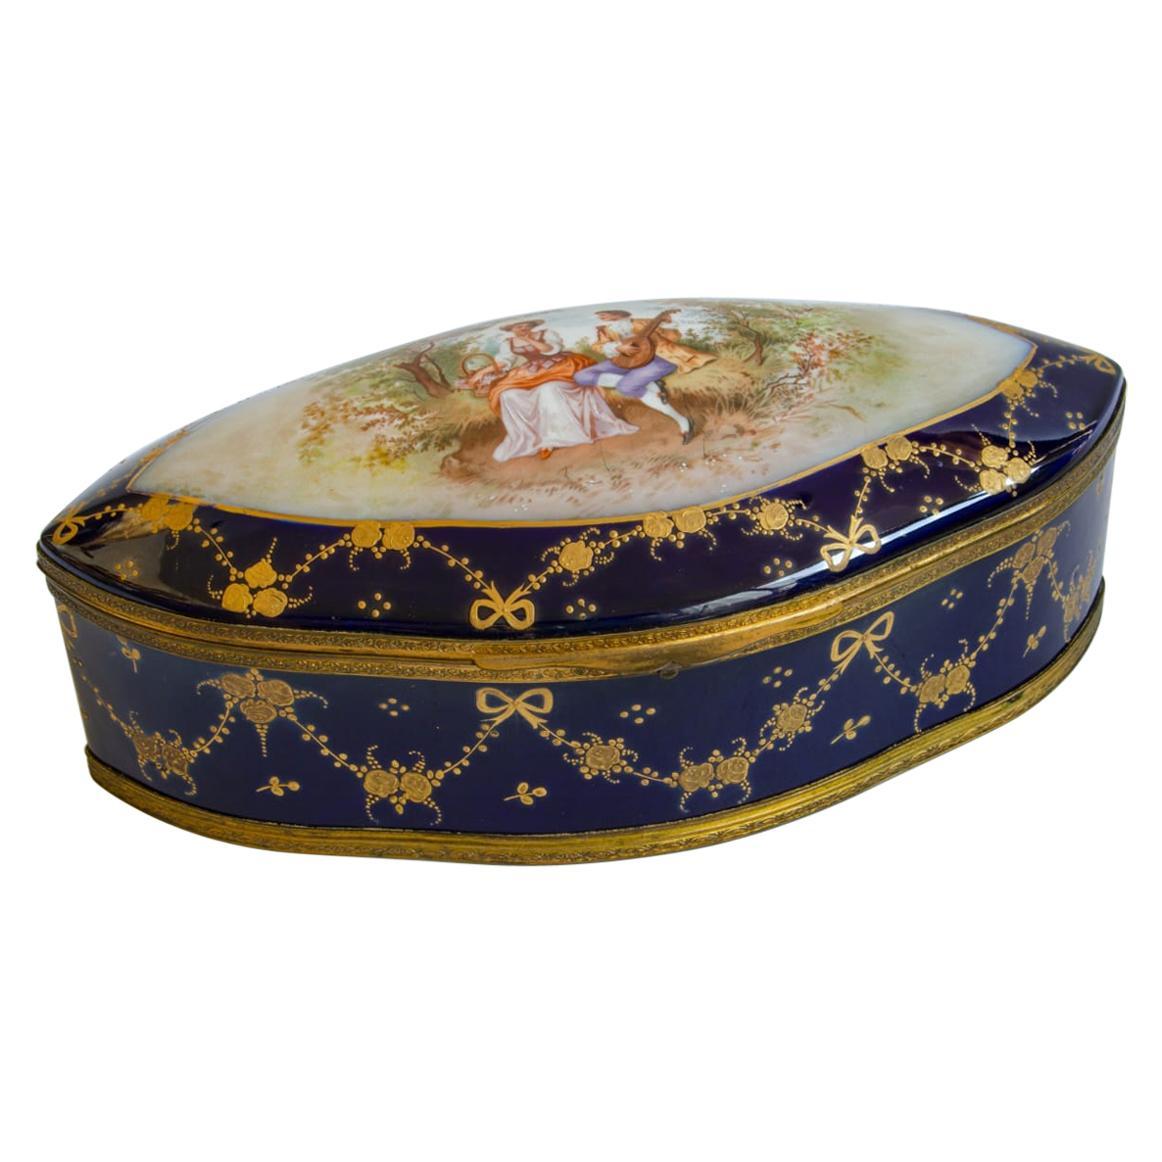 Box Sevres Porcelain Romantic Scene